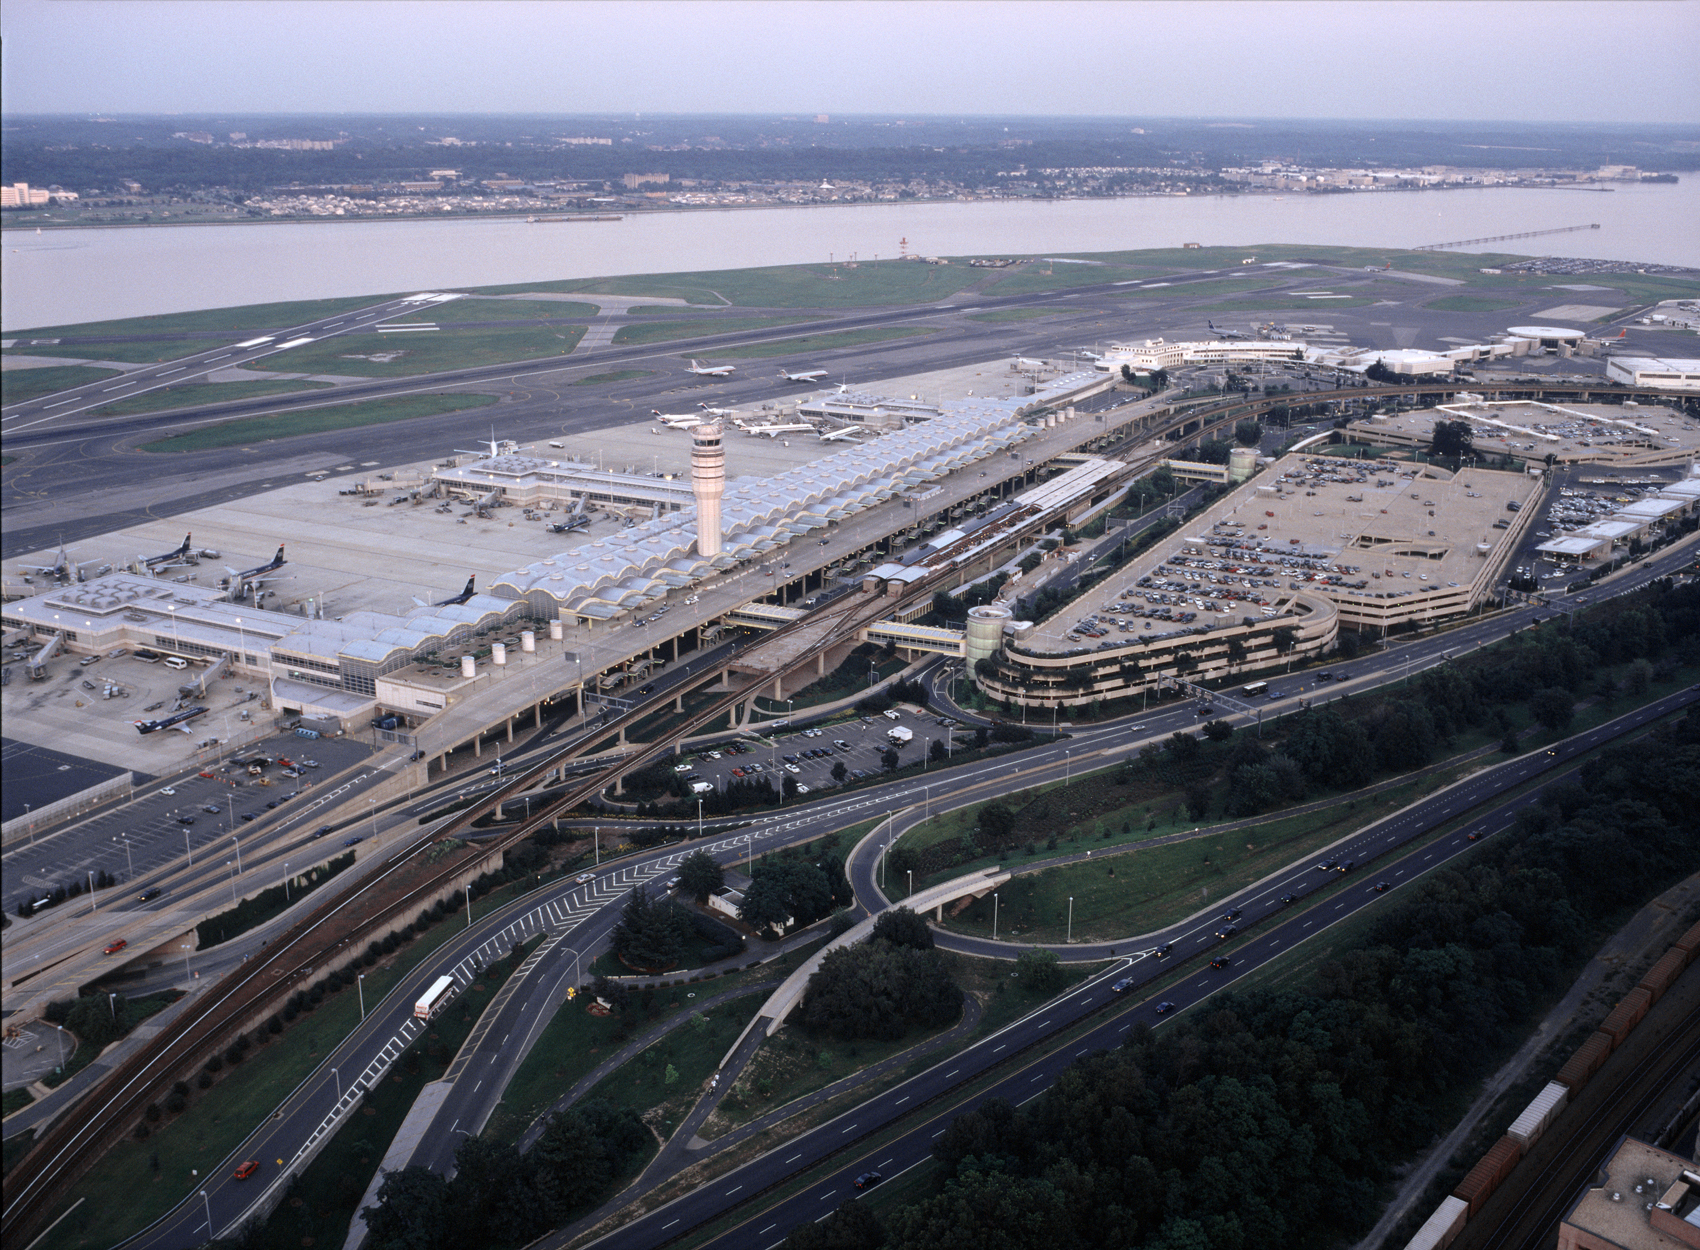 Washington Dulles International Airport - aviation parking deck design